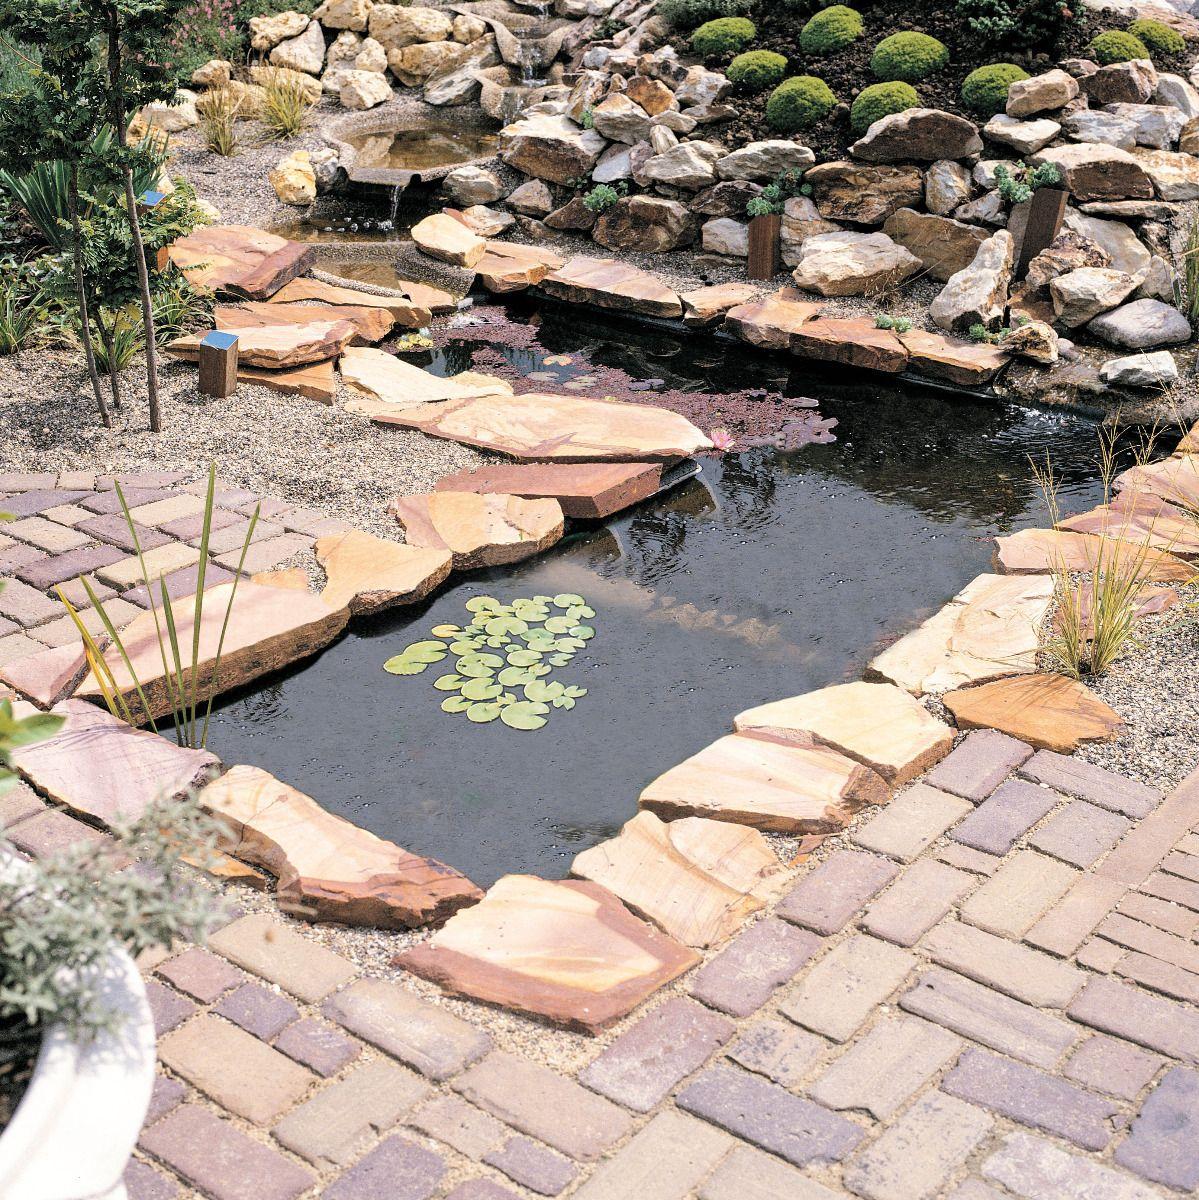 Comment Installer Un Bassin De Jardin Préformé ? serapportantà Kit Bassin De Jardin Préformé